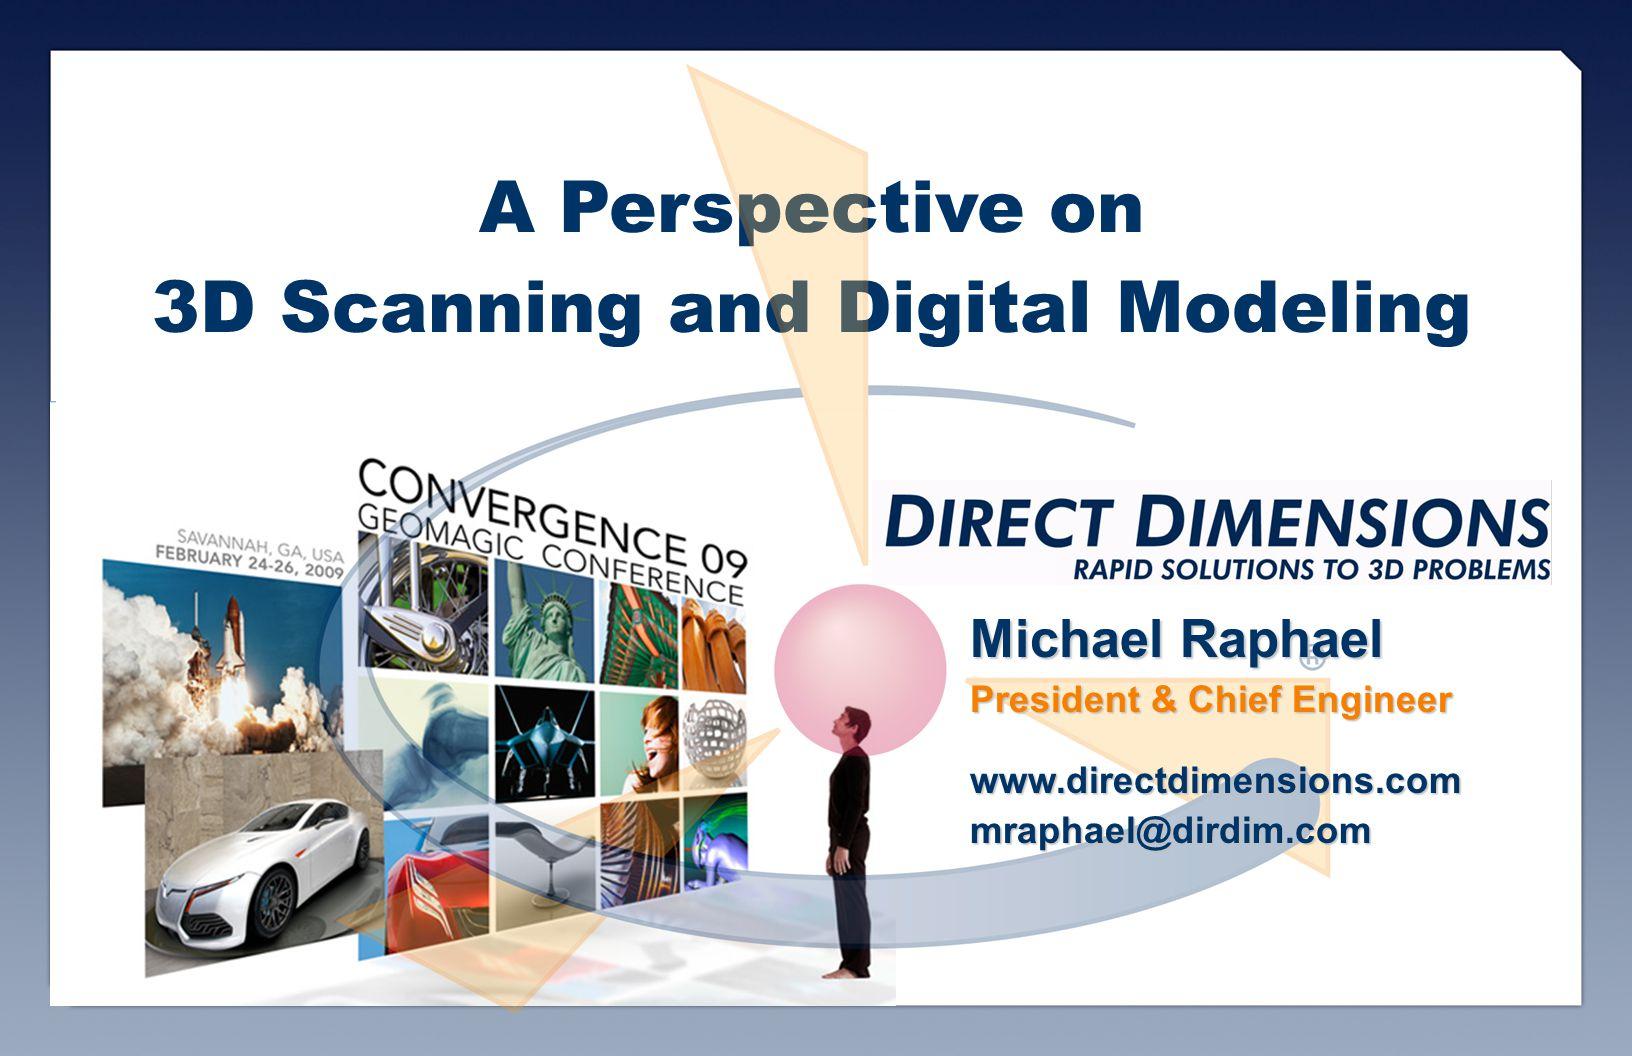 A Perspective on 3D Scanning and Digital Modeling Michael Raphael President & Chief Engineer www.directdimensions.commraphael@dirdim.com